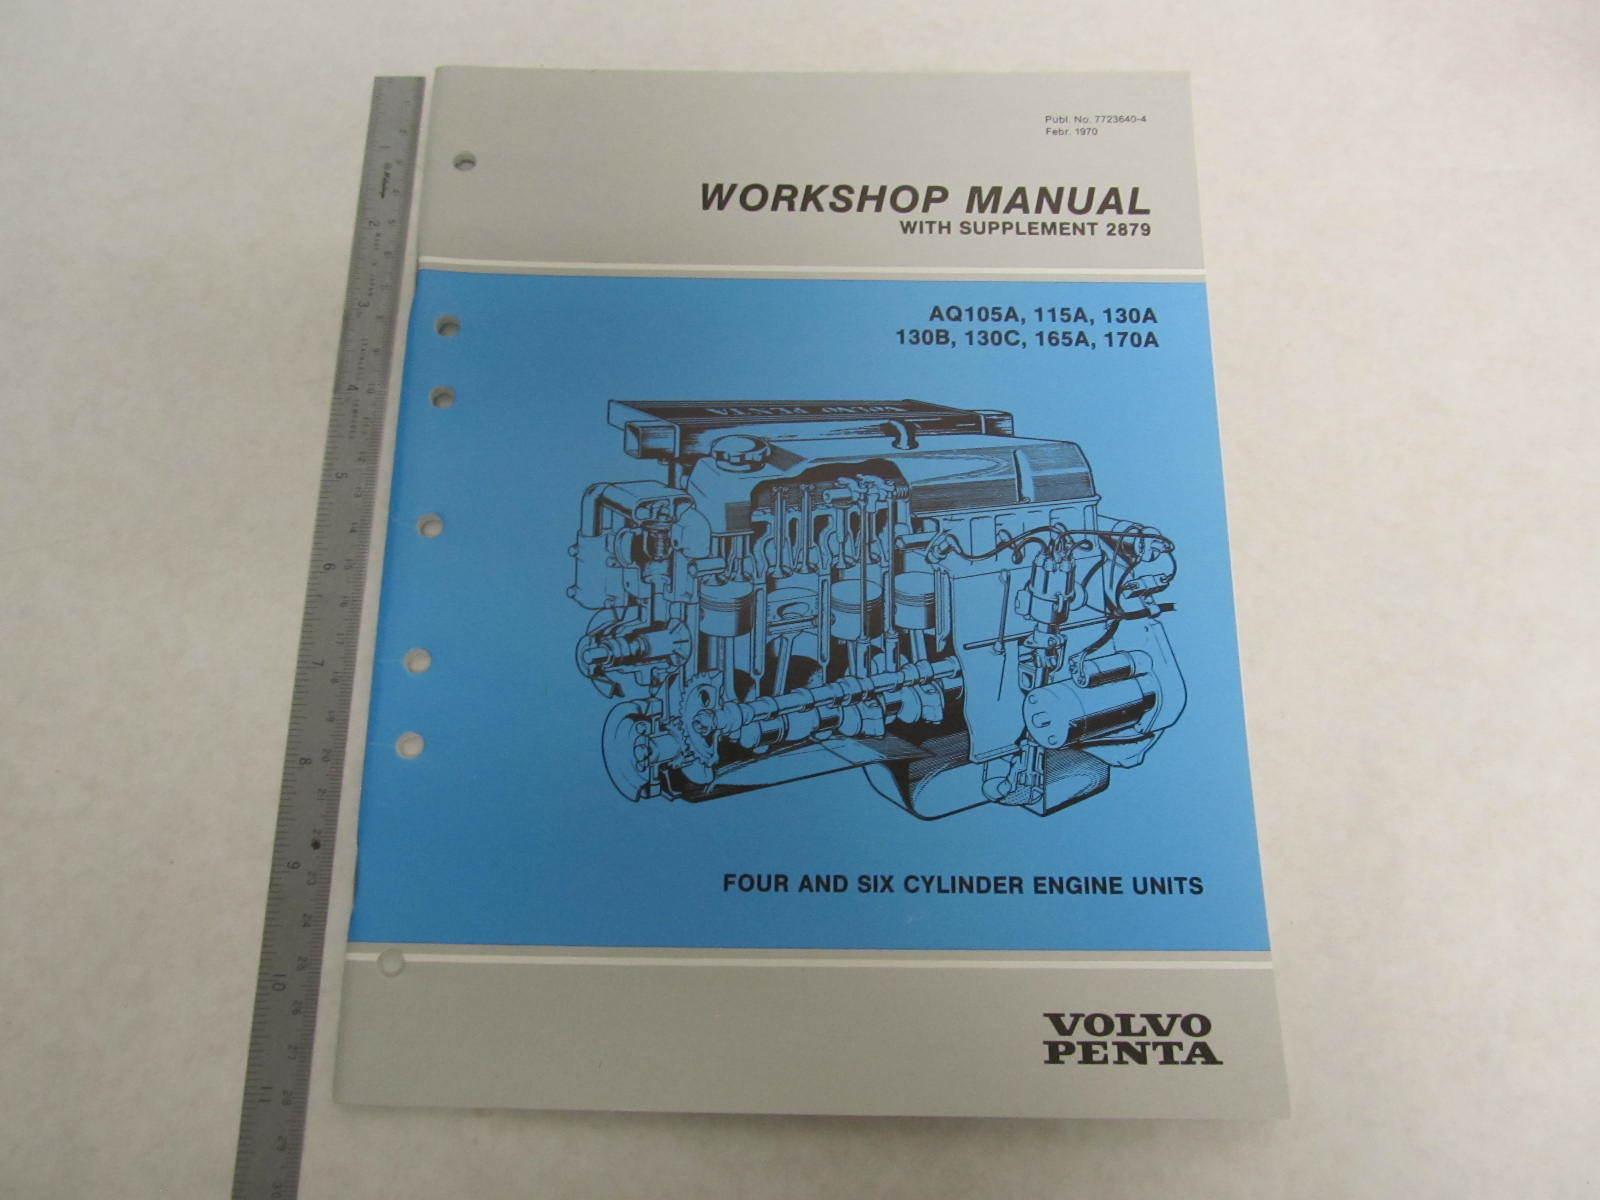 7723640 4 1970 73 volvo penta aquamatic service workshop Volvo Penta Parts Volvo Penta Engine Manuals